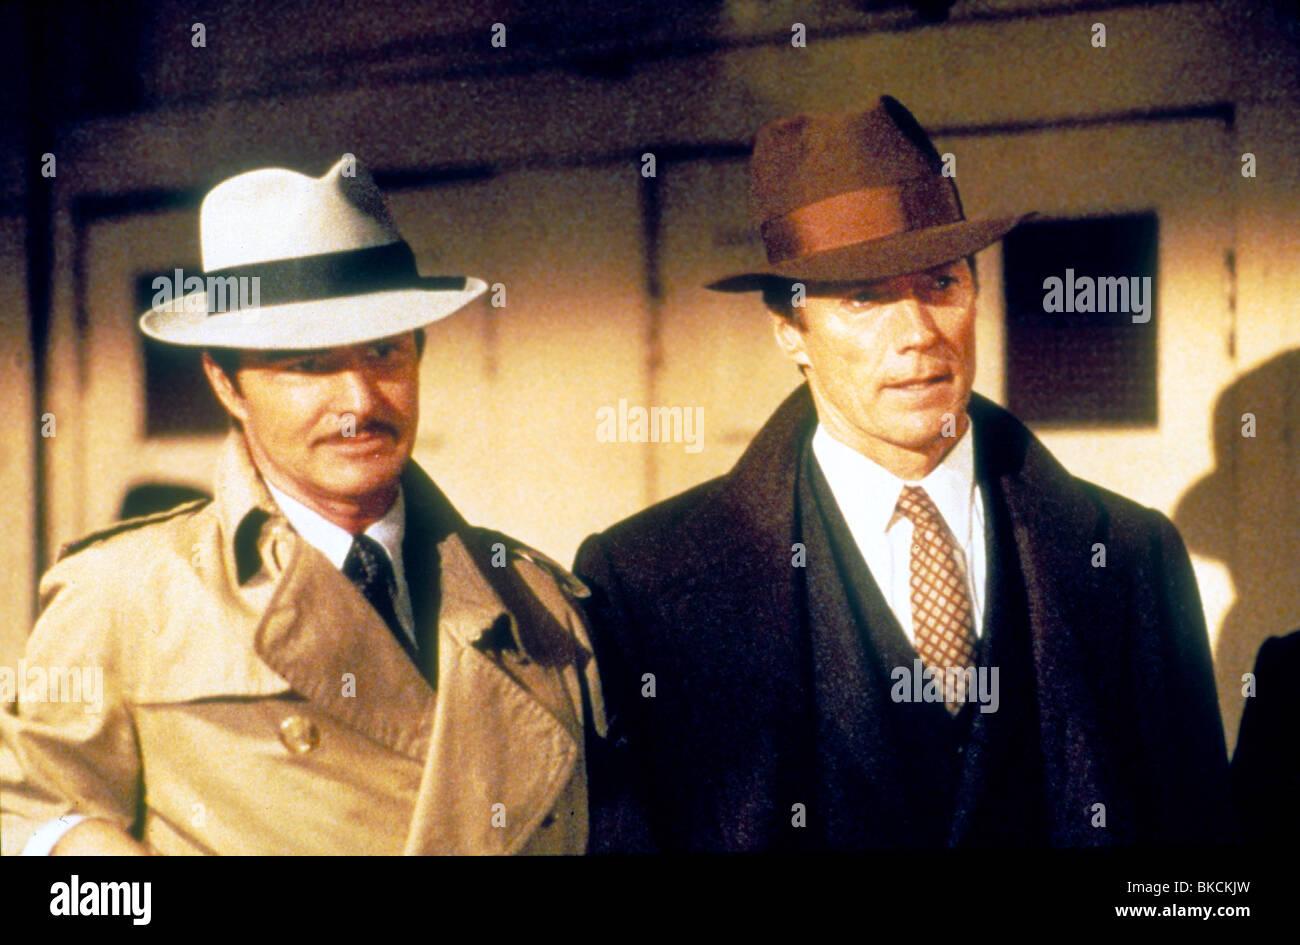 CITY HEAT (1984) BURT REYNOLDS, CLINT EASTWOOD CIH 050 - Stock Image